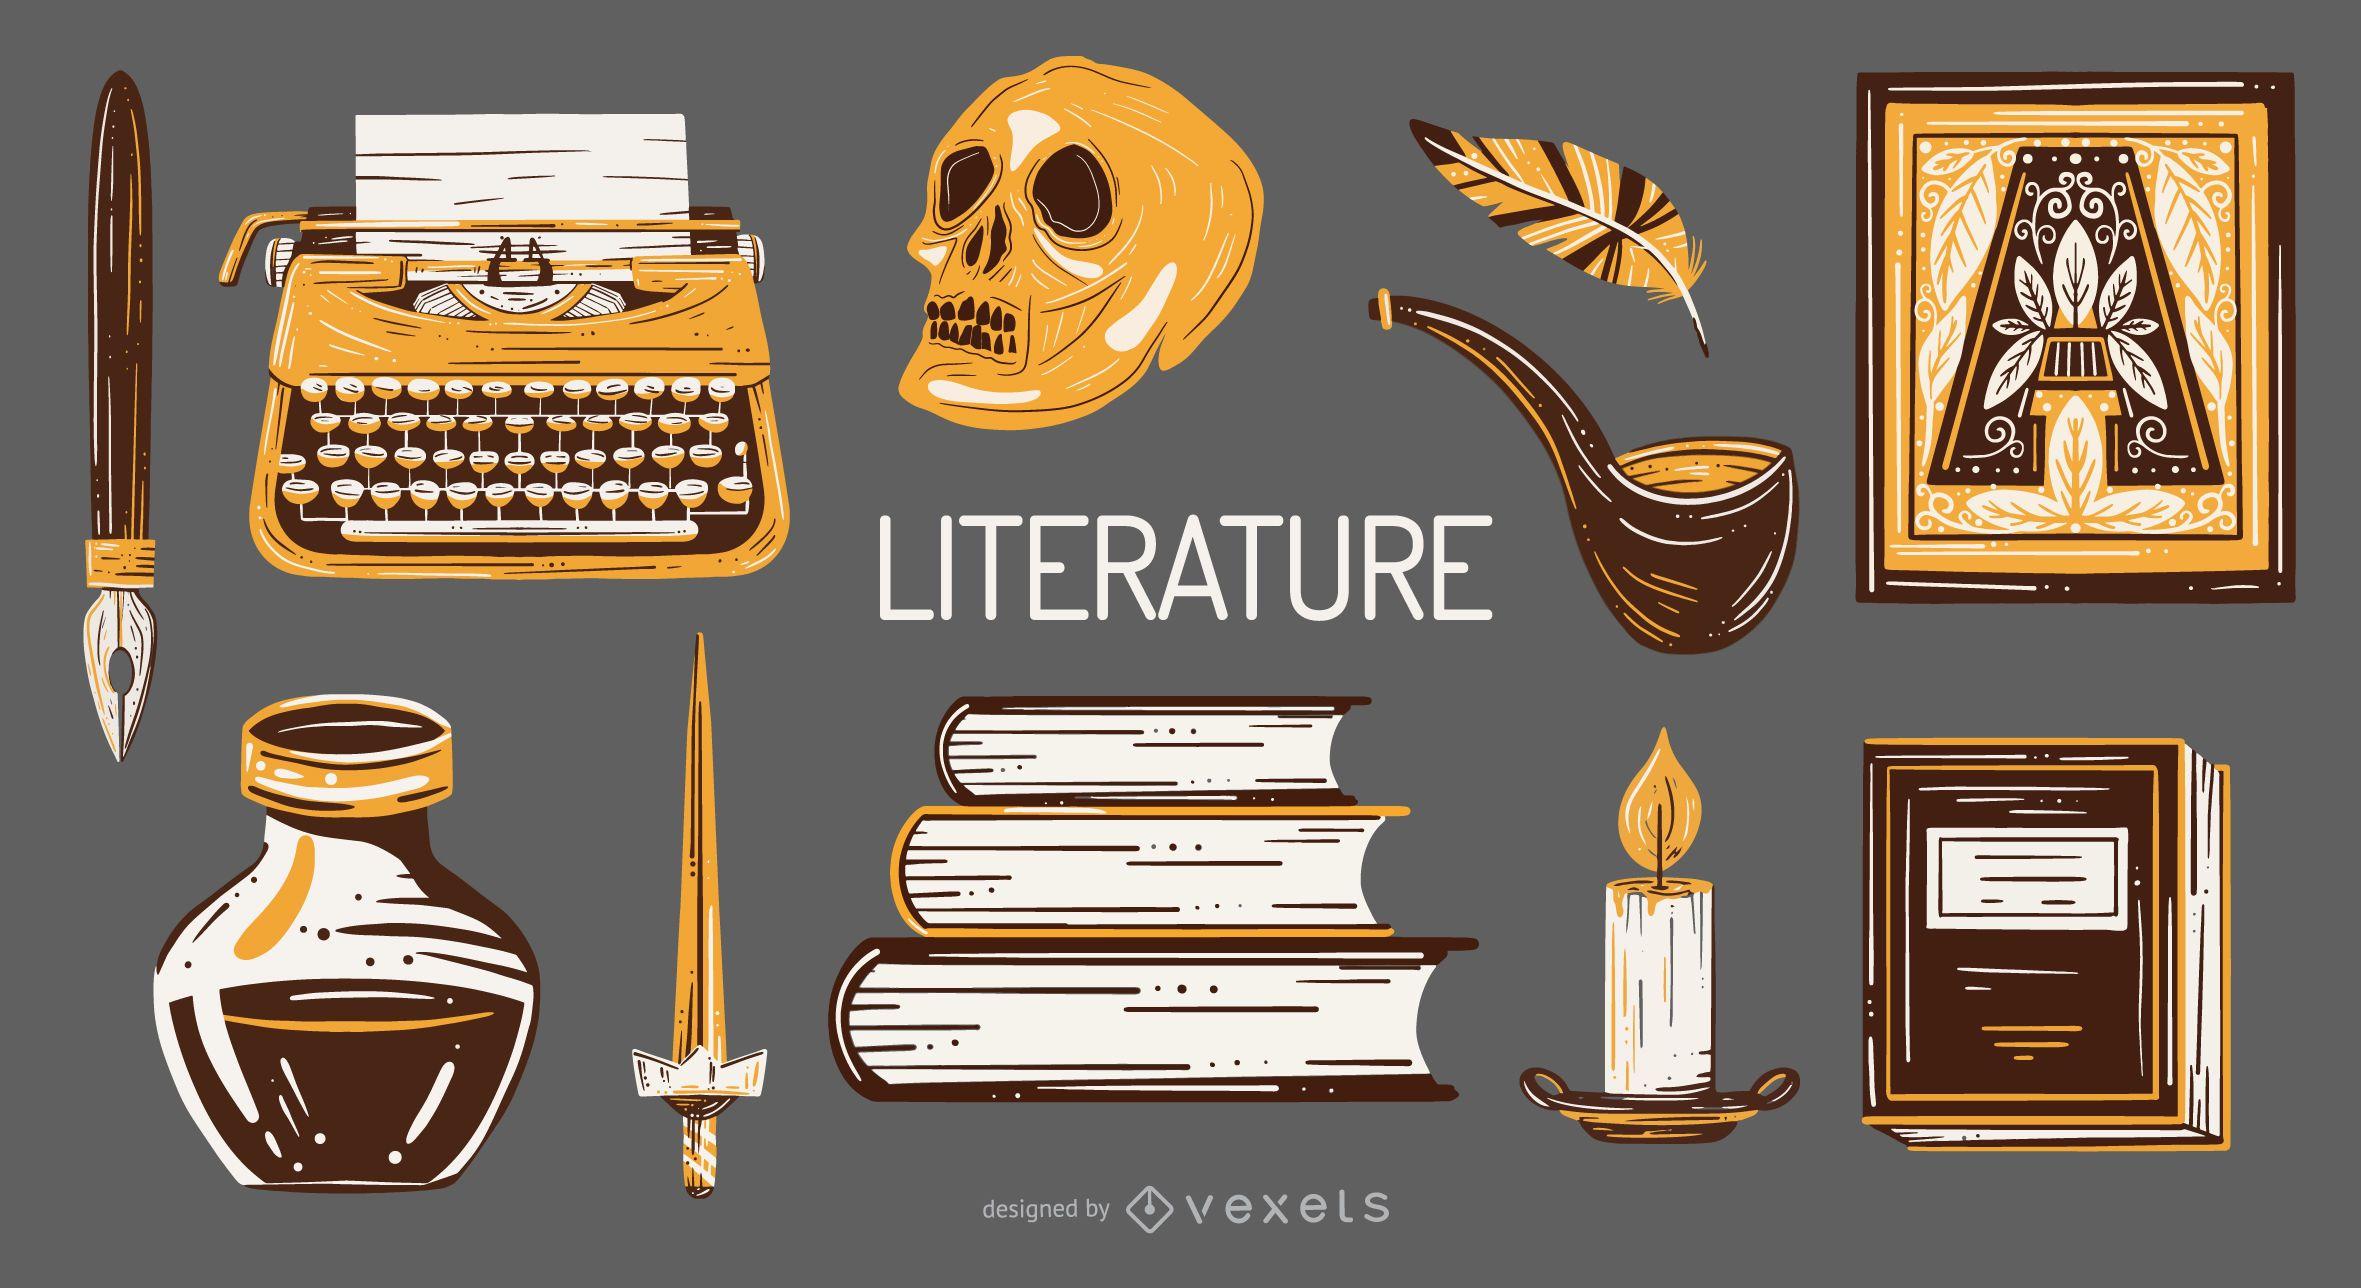 Literature School Elements Illustration Pack